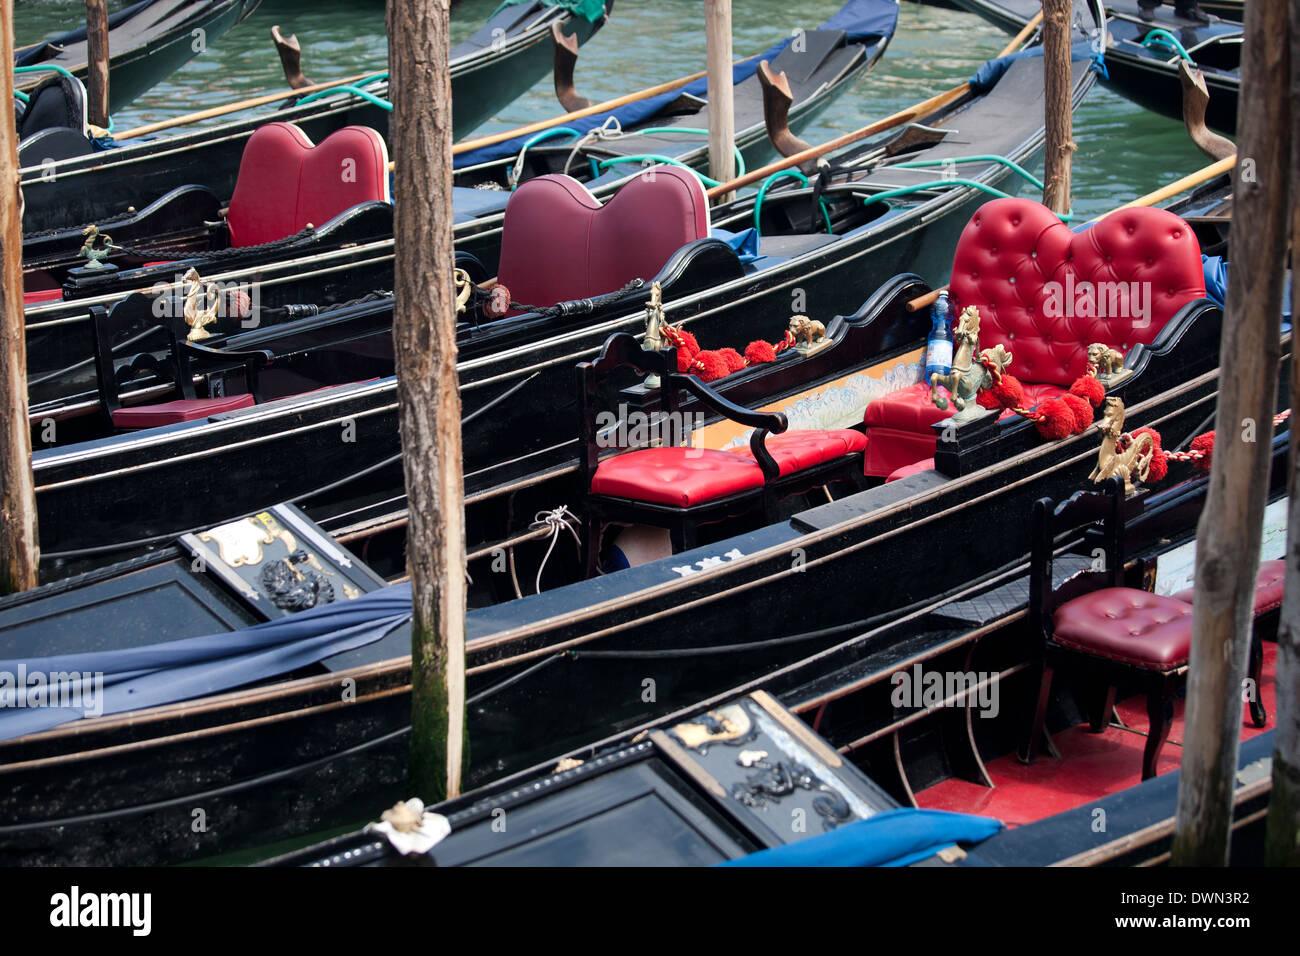 gondolas in Venice - Stock Image